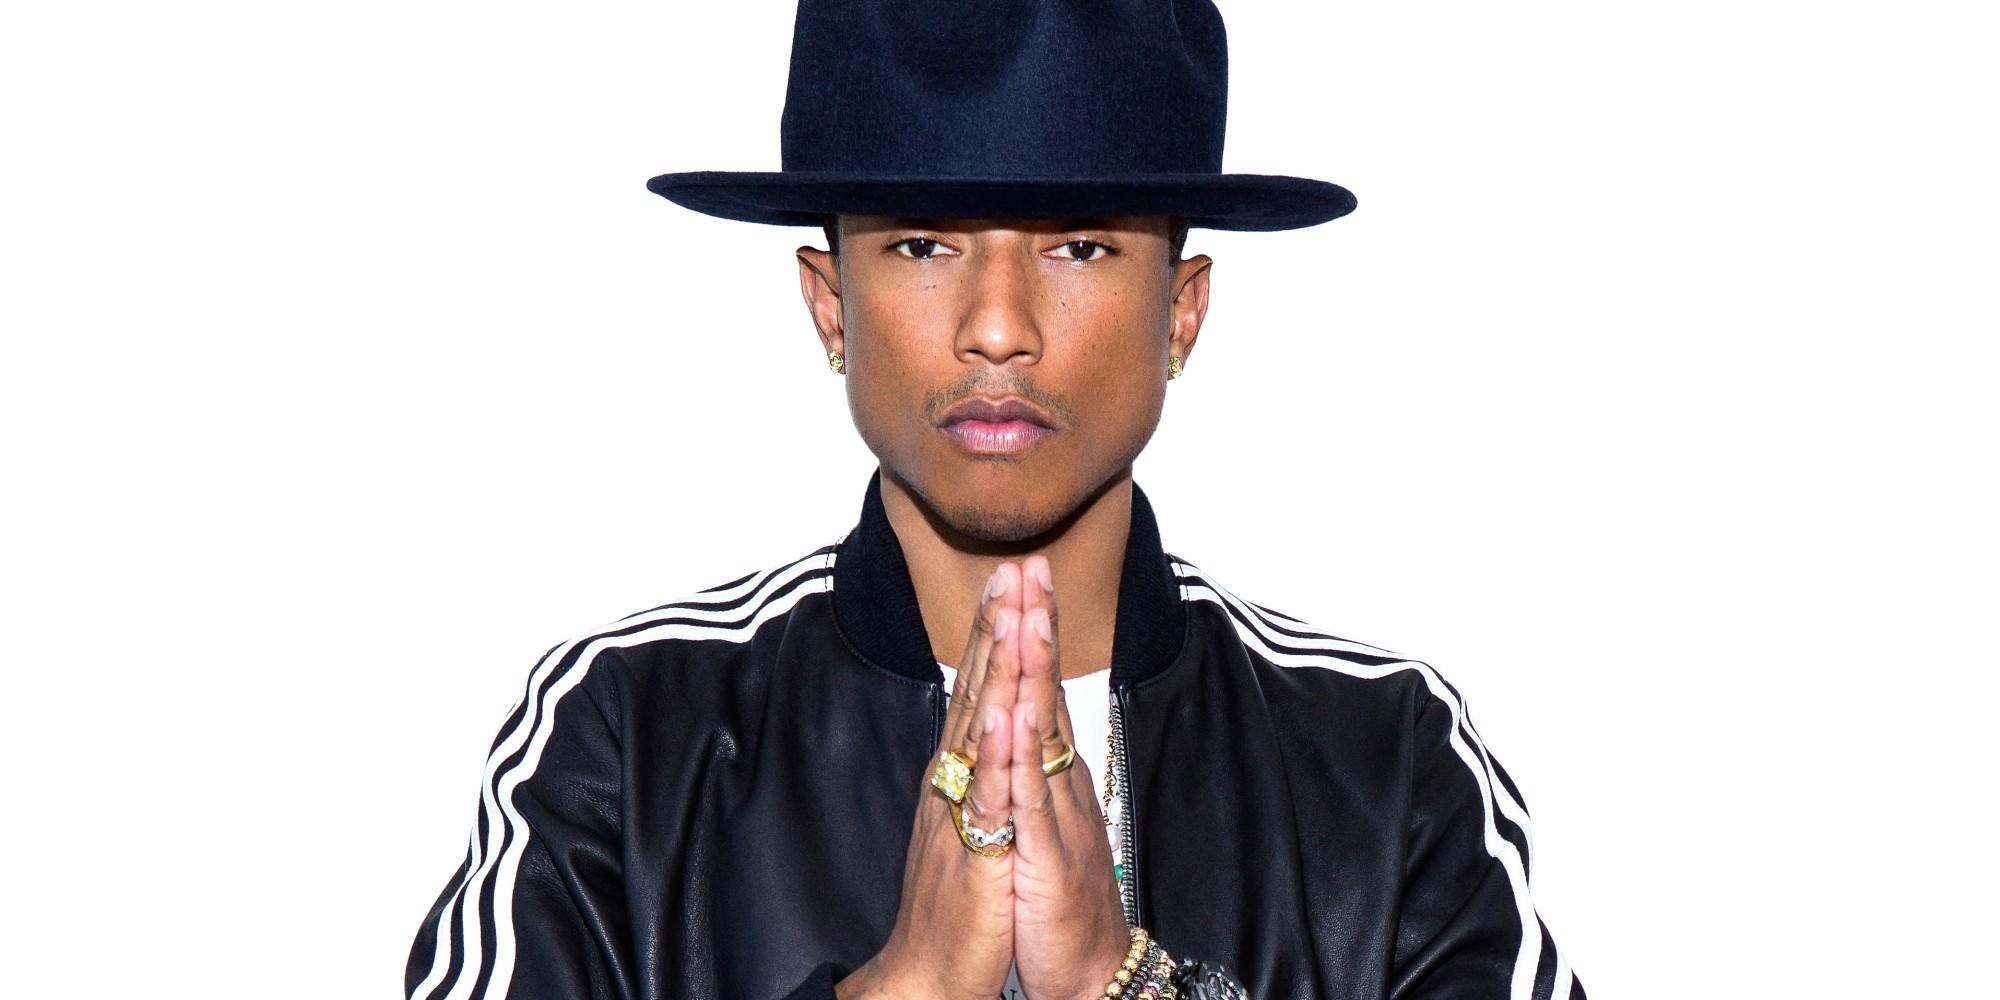 Pharrell Williams High Definition